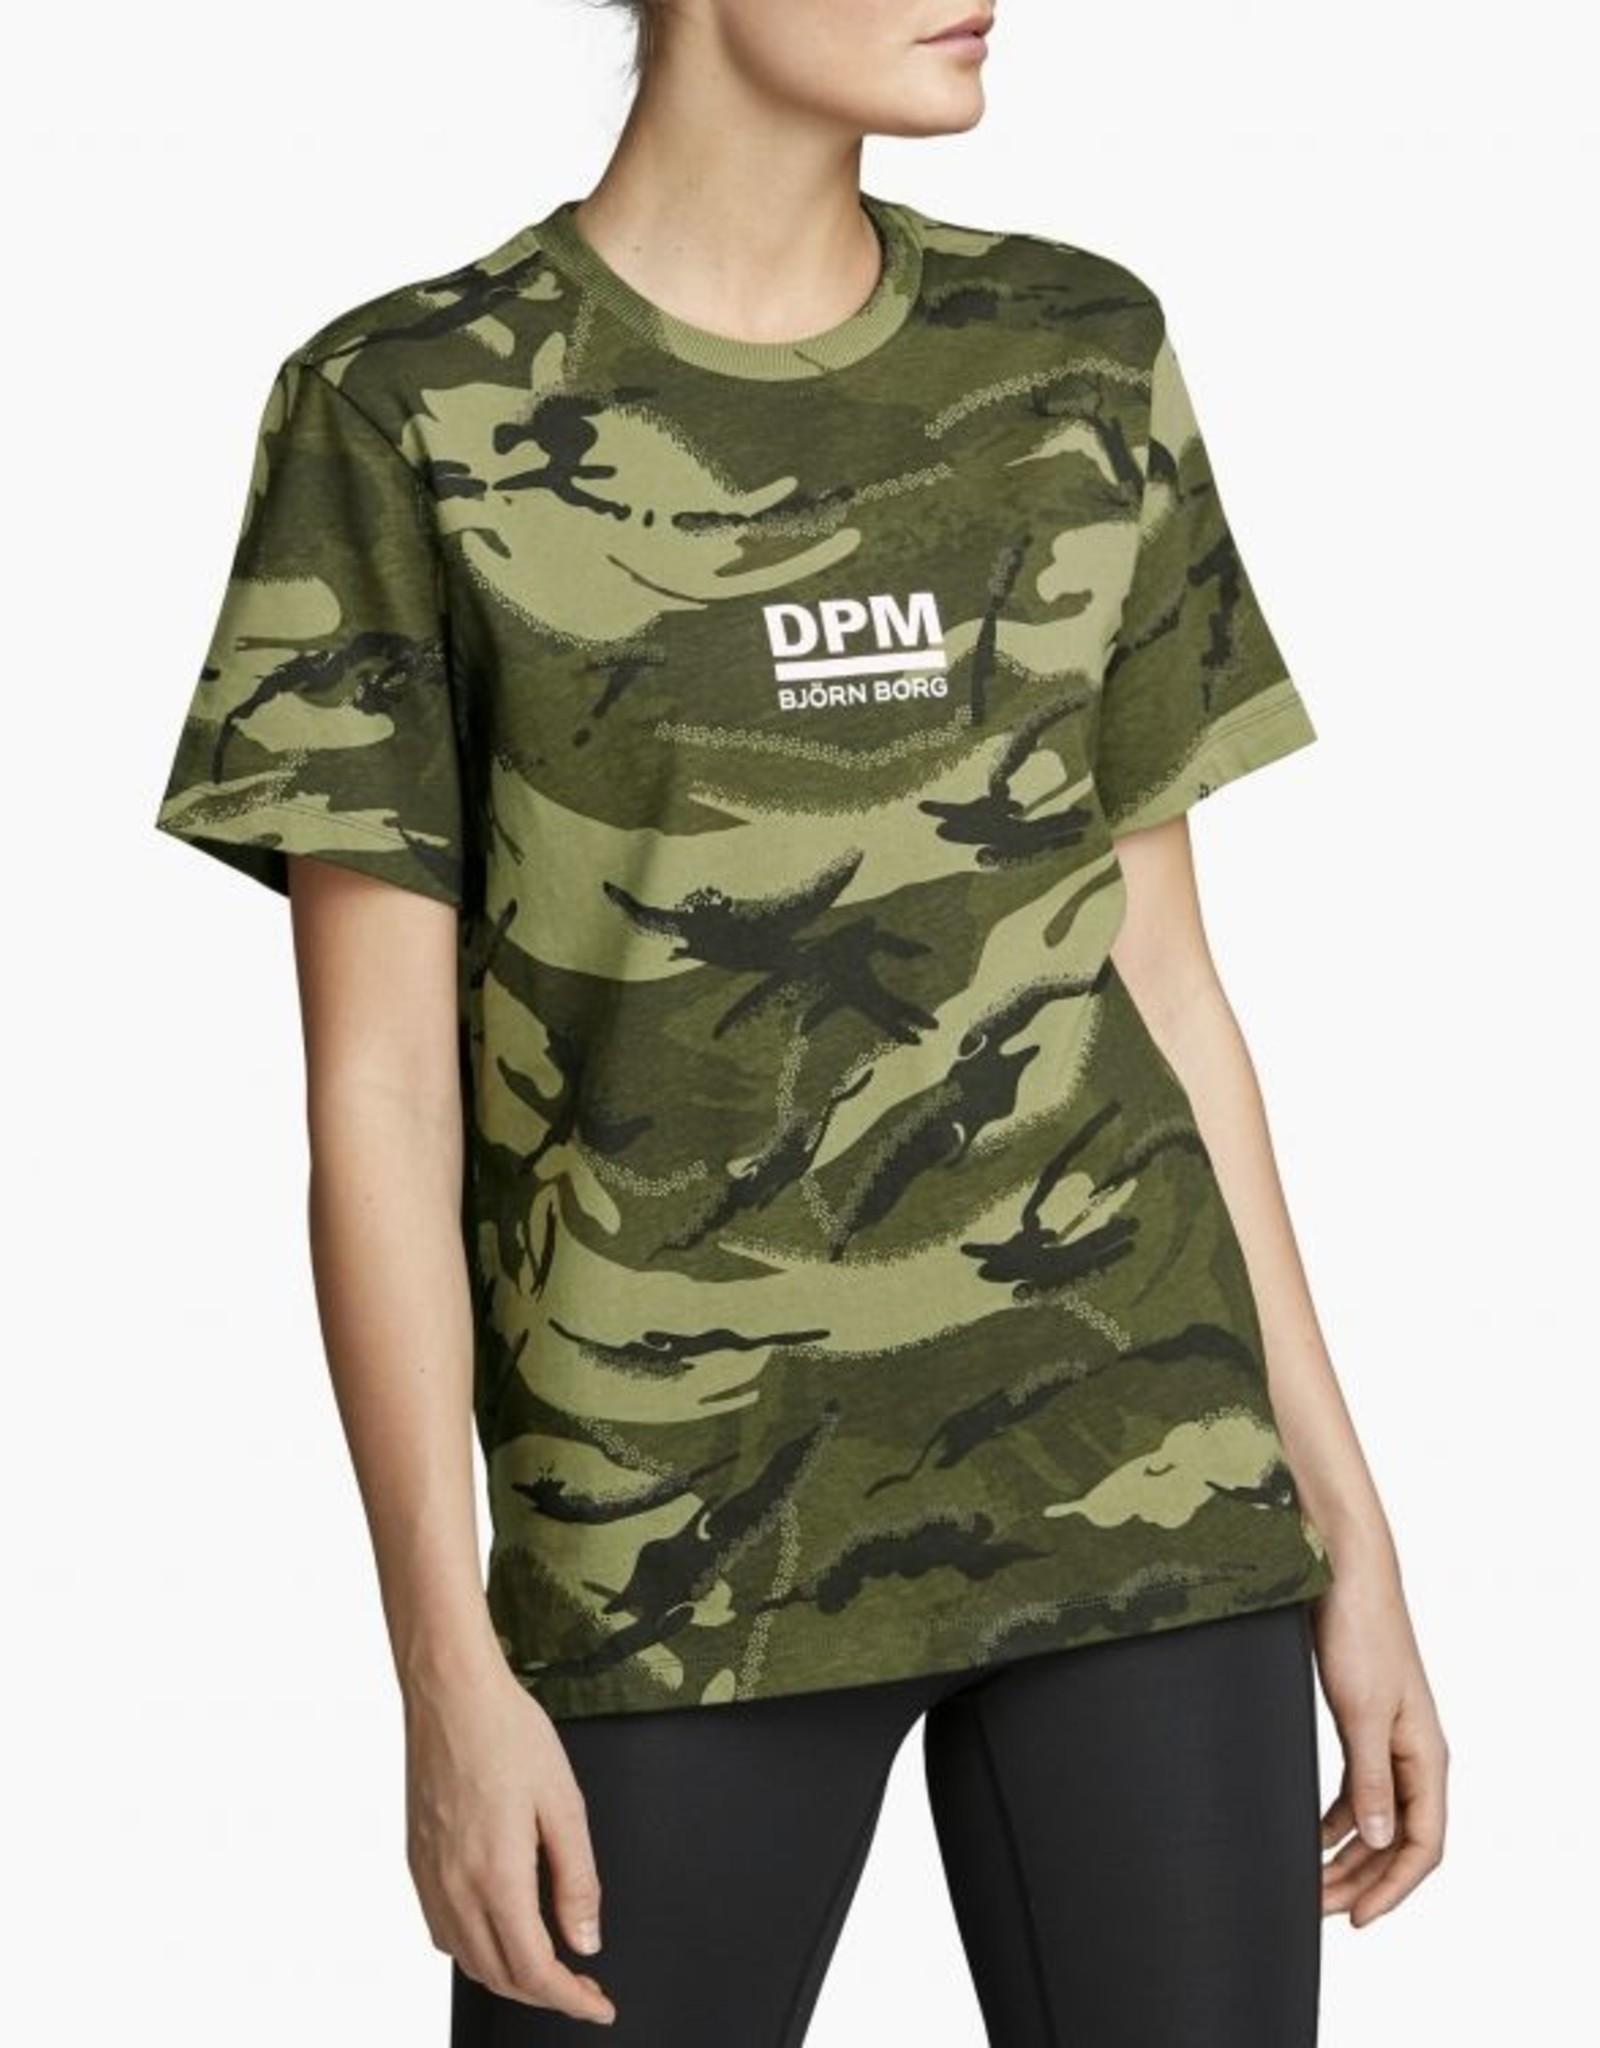 Bjorn Borg Shirt DPM